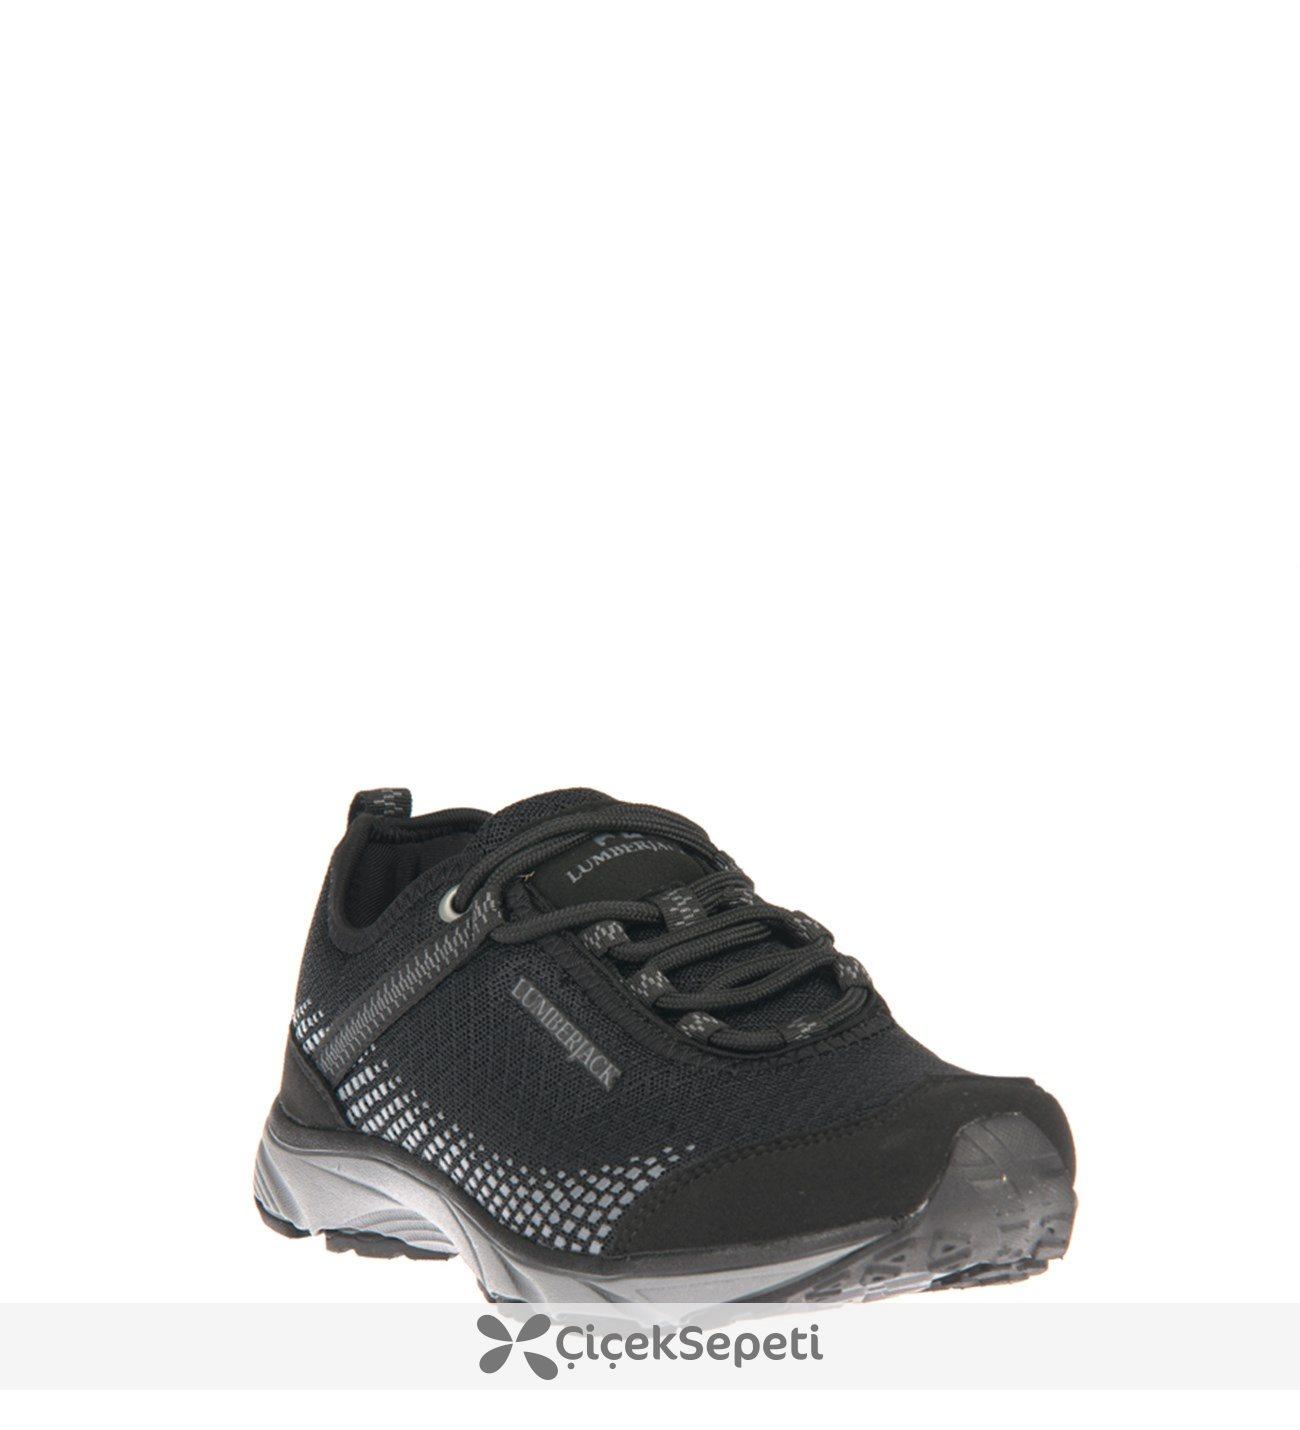 Lumberjack Erkek Ayakkabı 8122L DARE Siyah-Siyah